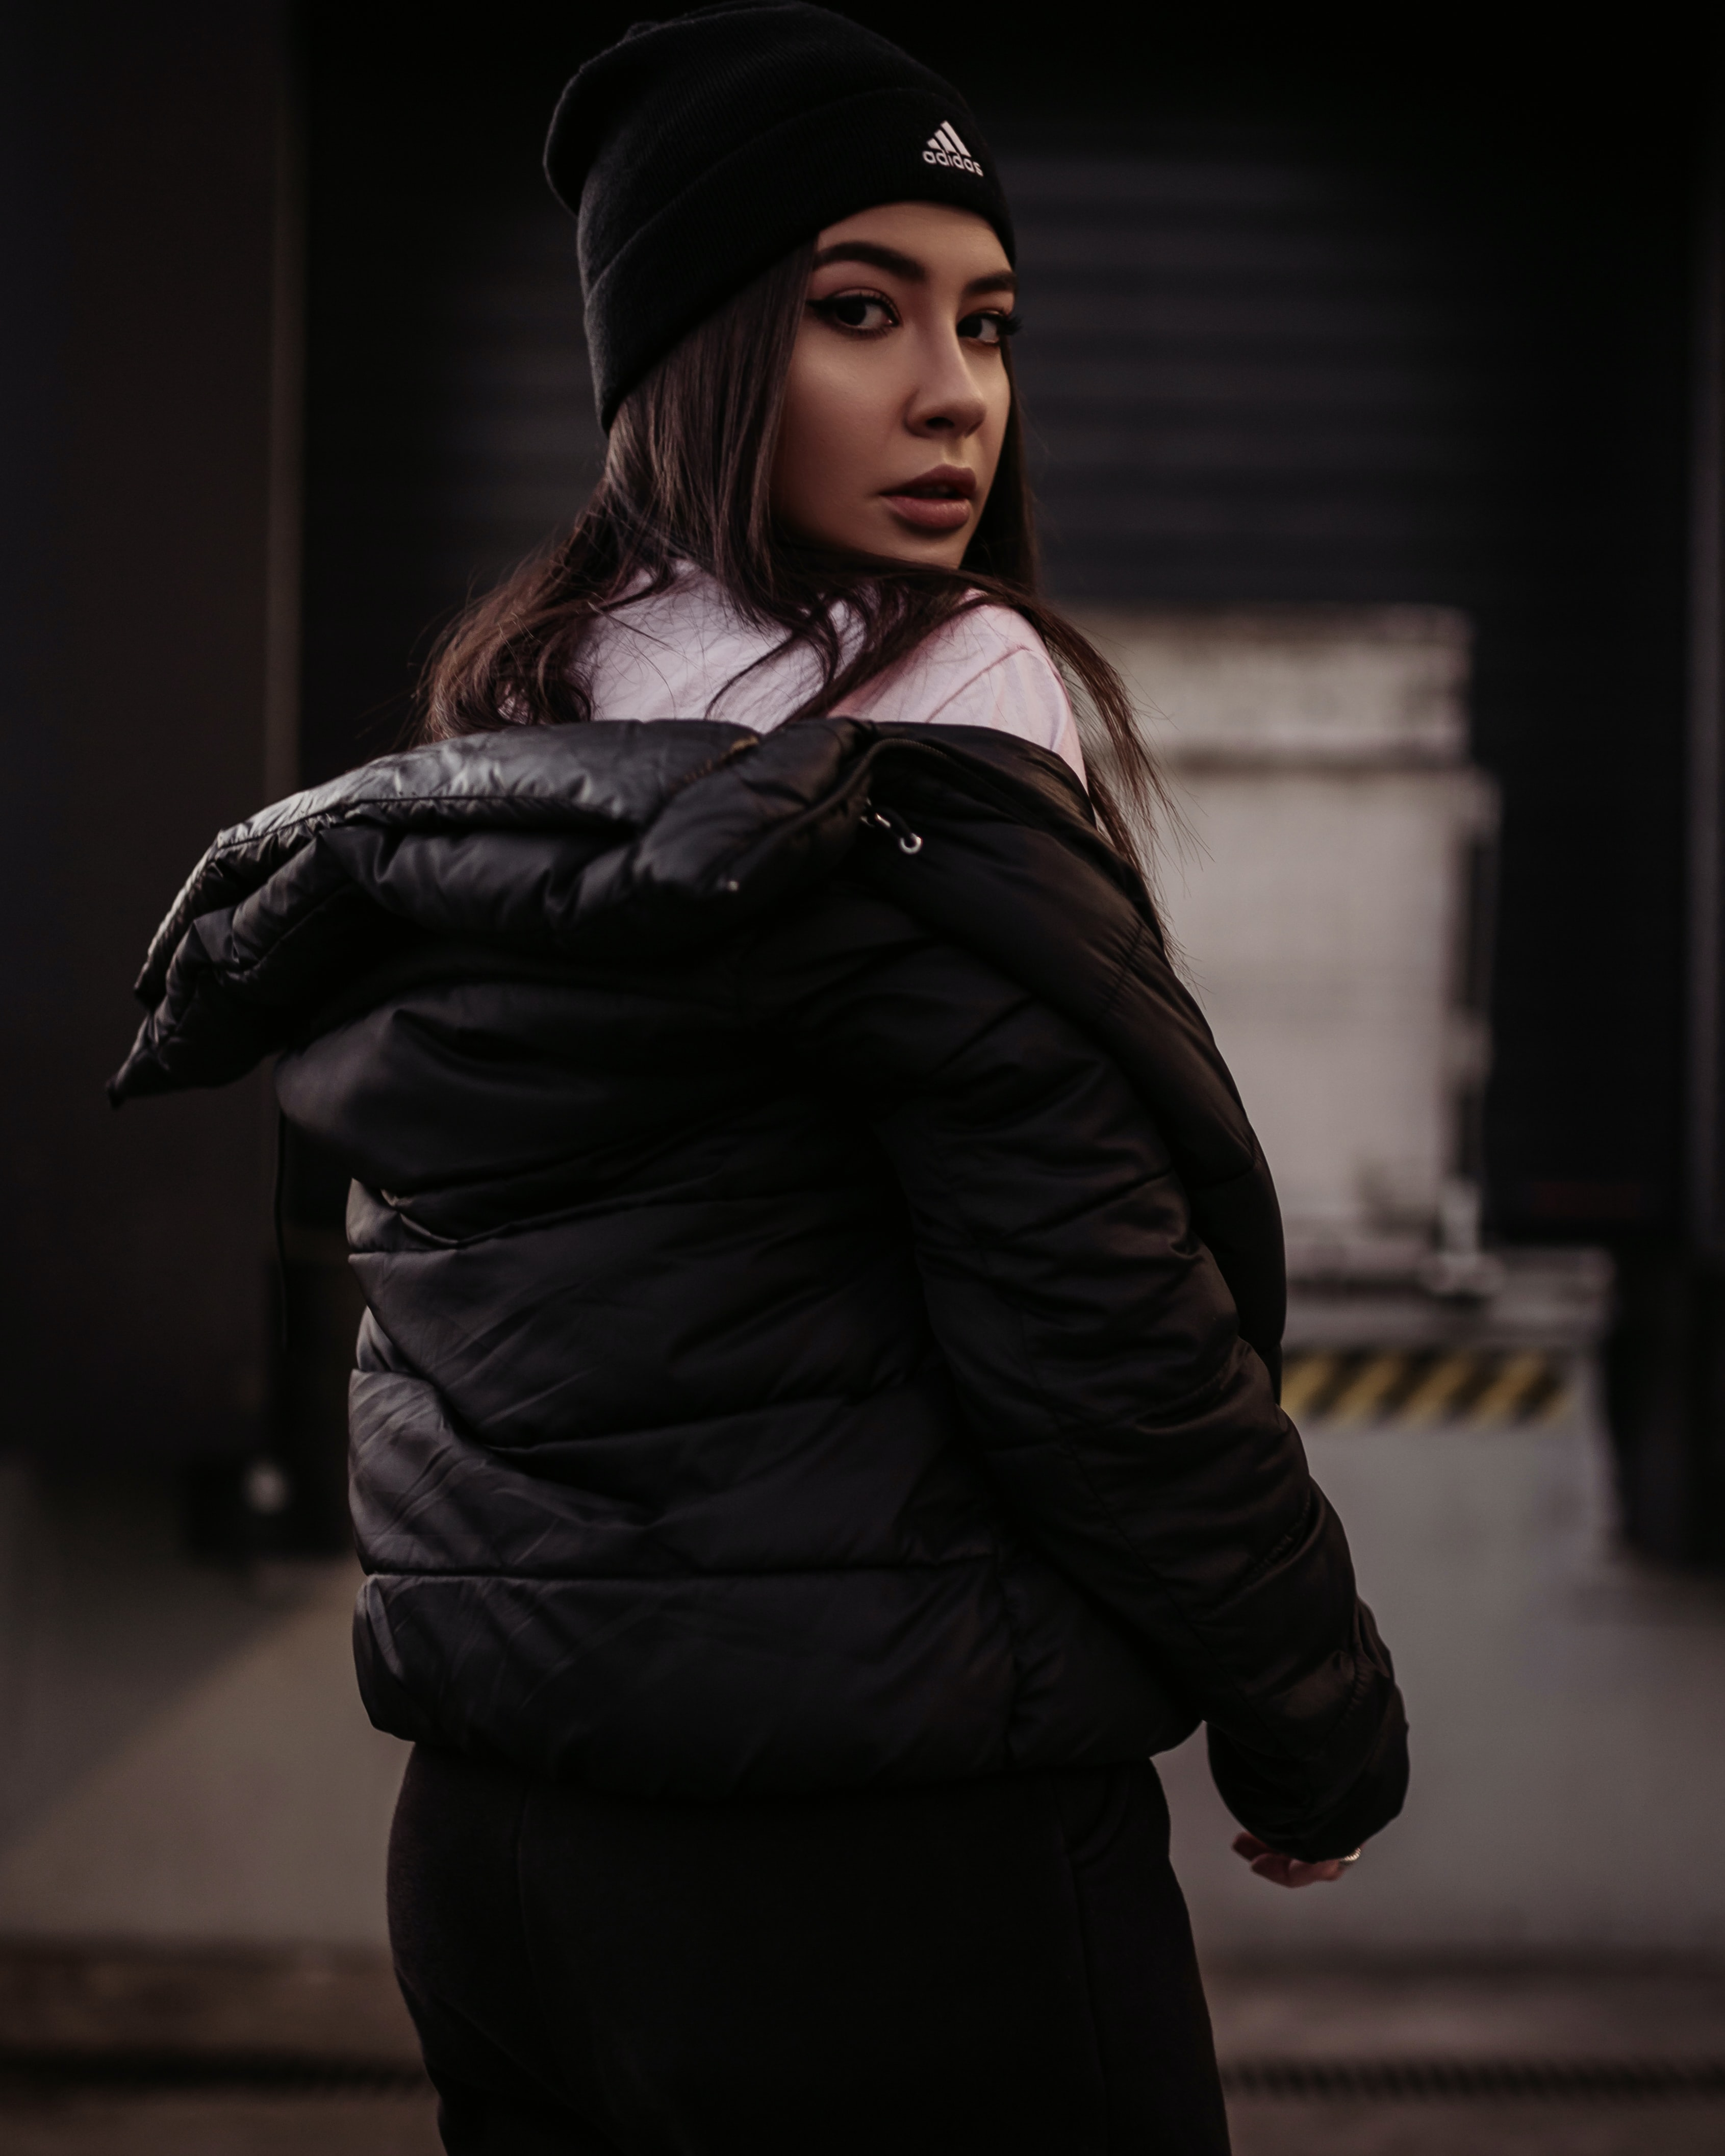 woman in black jacket turning head back